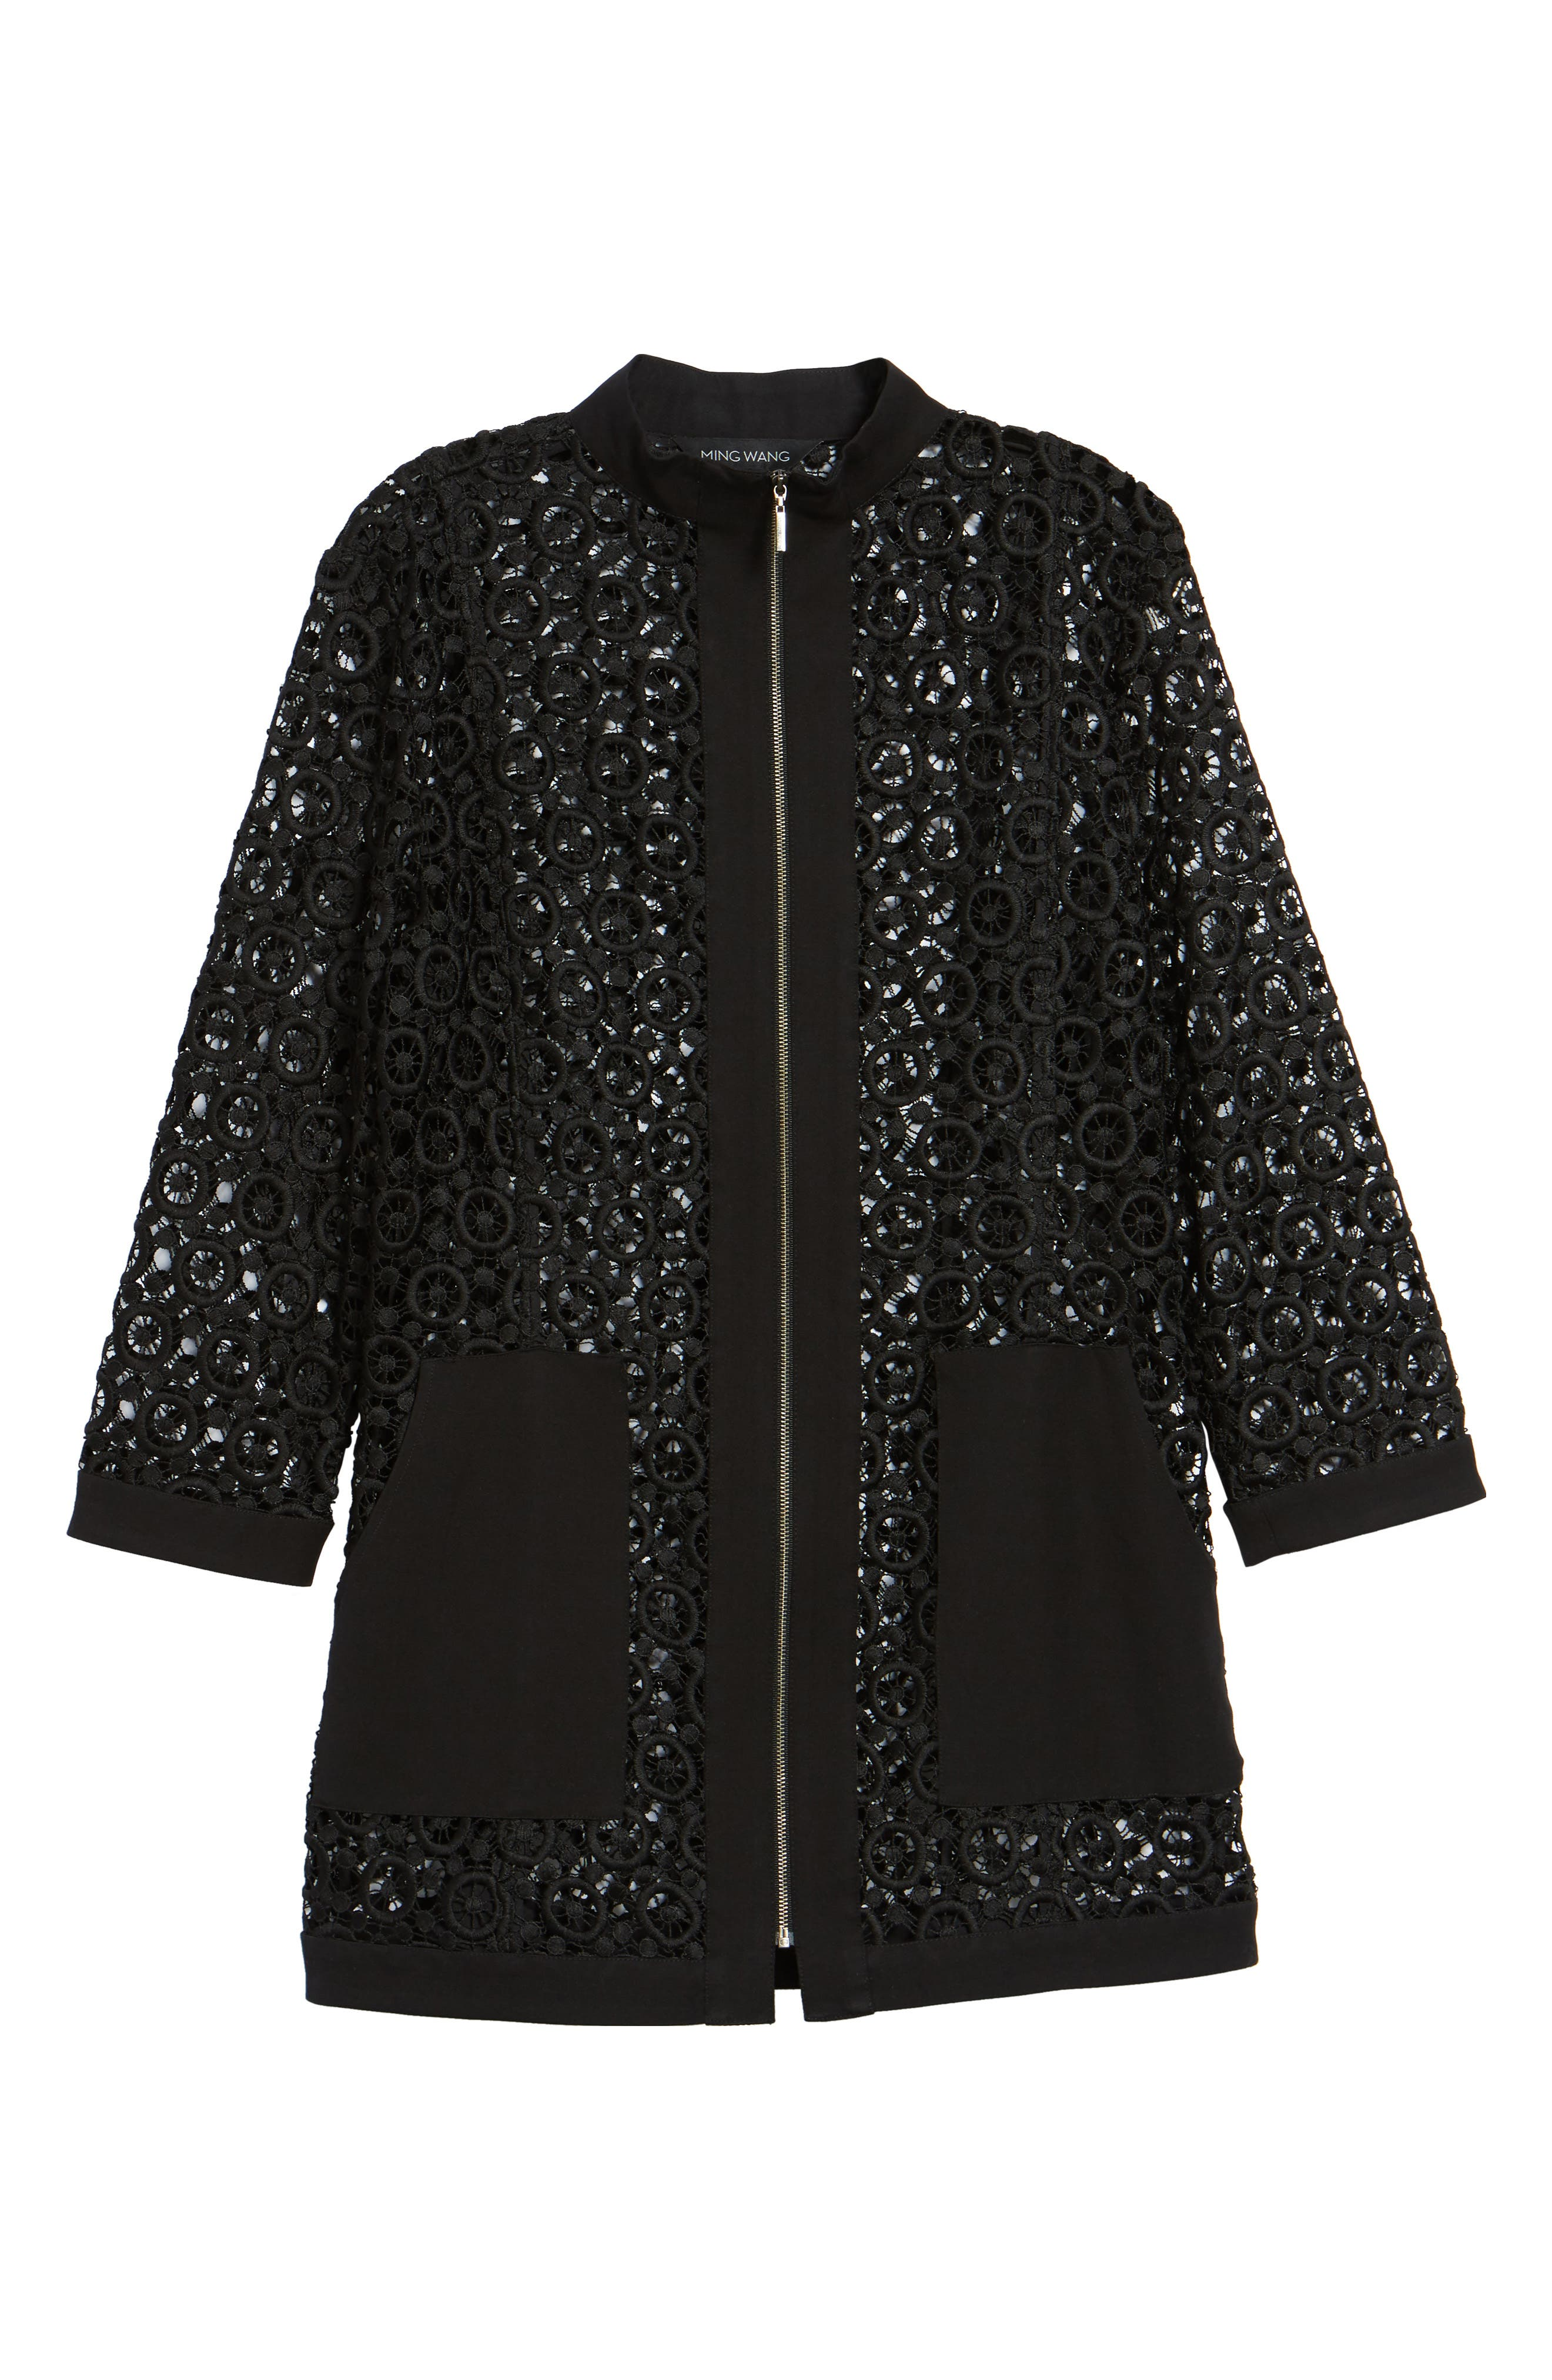 Pointelle Zip Front Jacket,                             Alternate thumbnail 6, color,                             Black